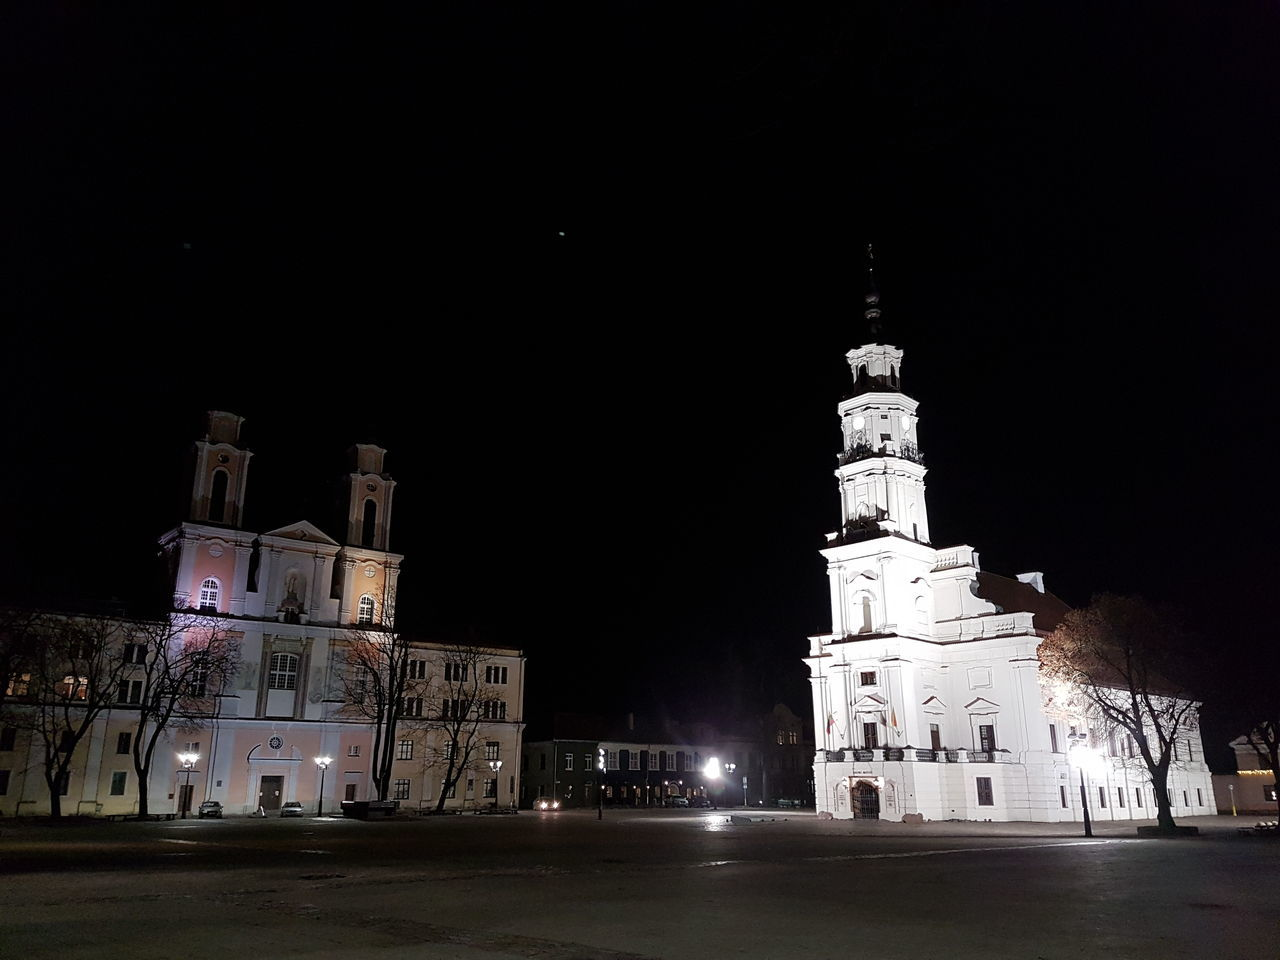 Night Photography Kaunas At Night Samsung Galaxy S7 Edge